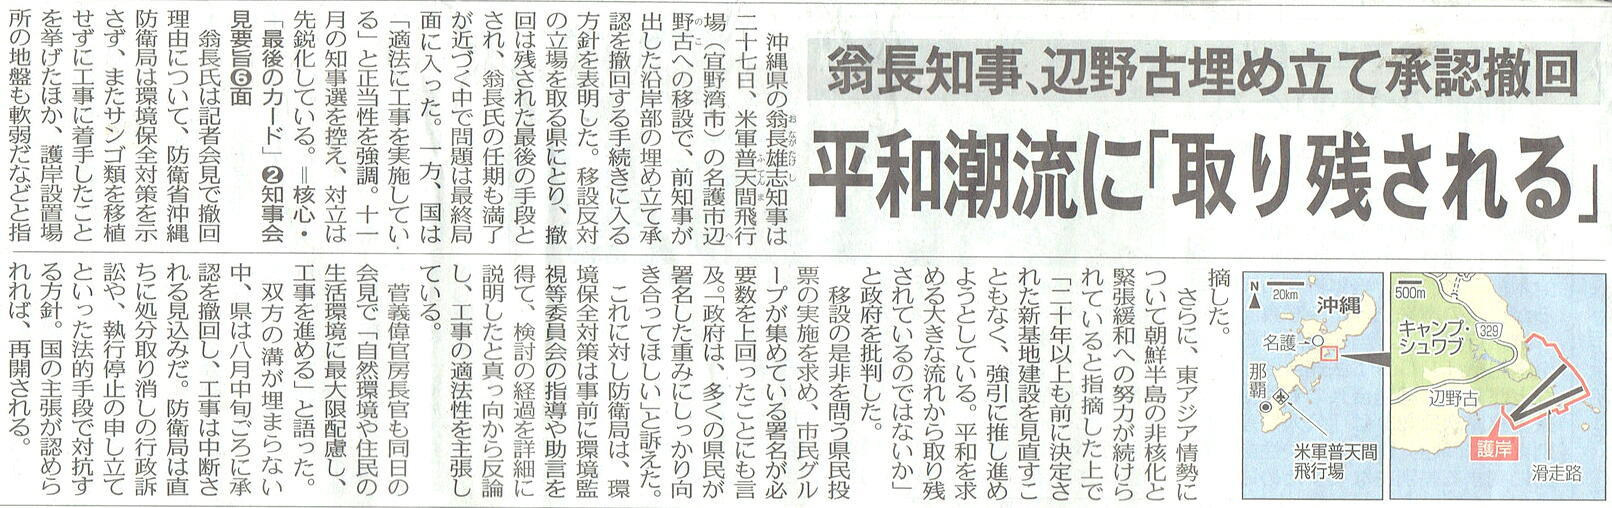 tokyo2018 07281